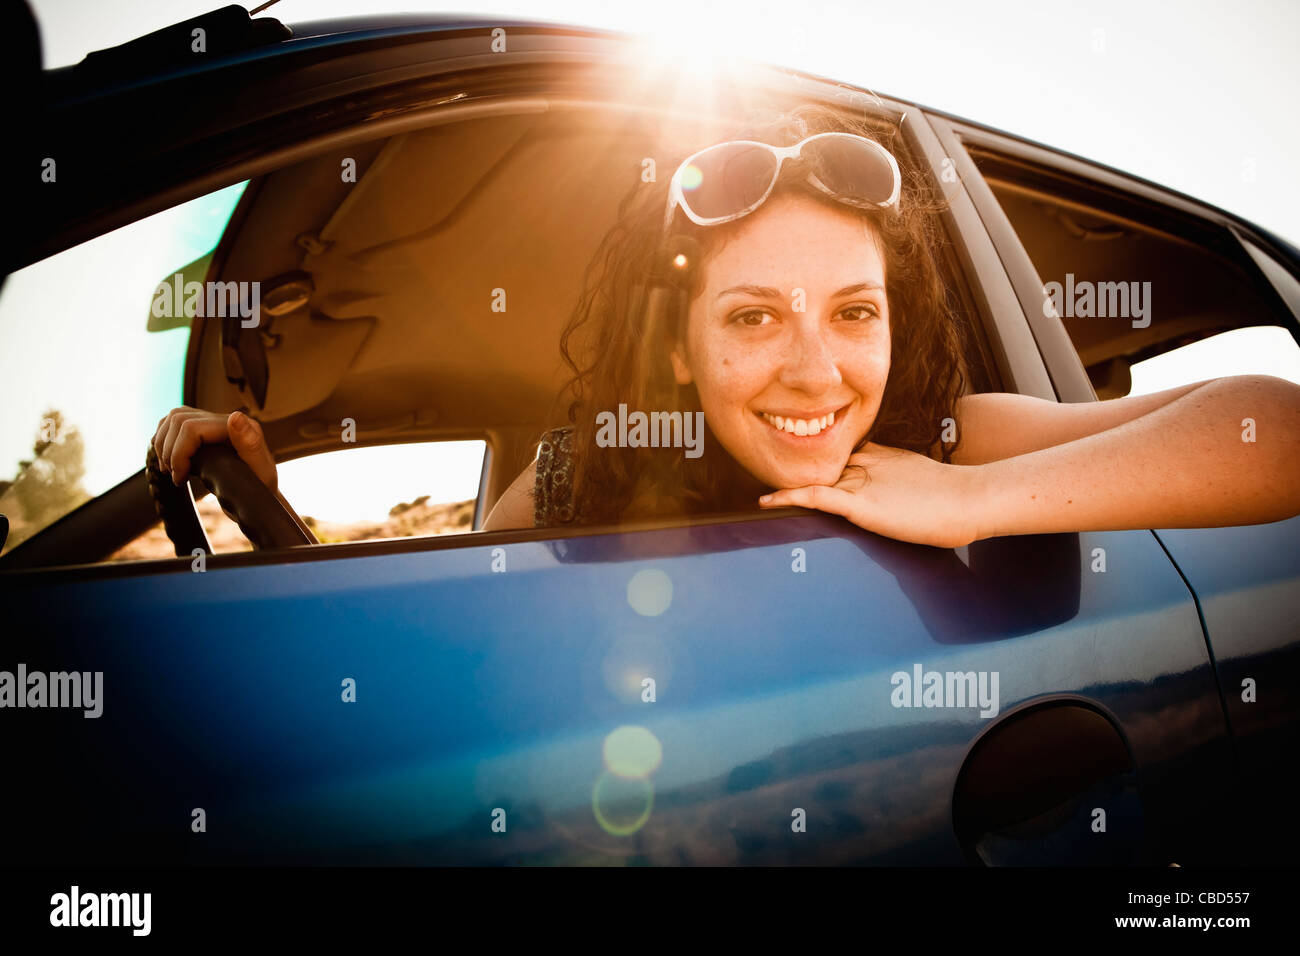 Lächelnde Frau Auto fahren Stockbild